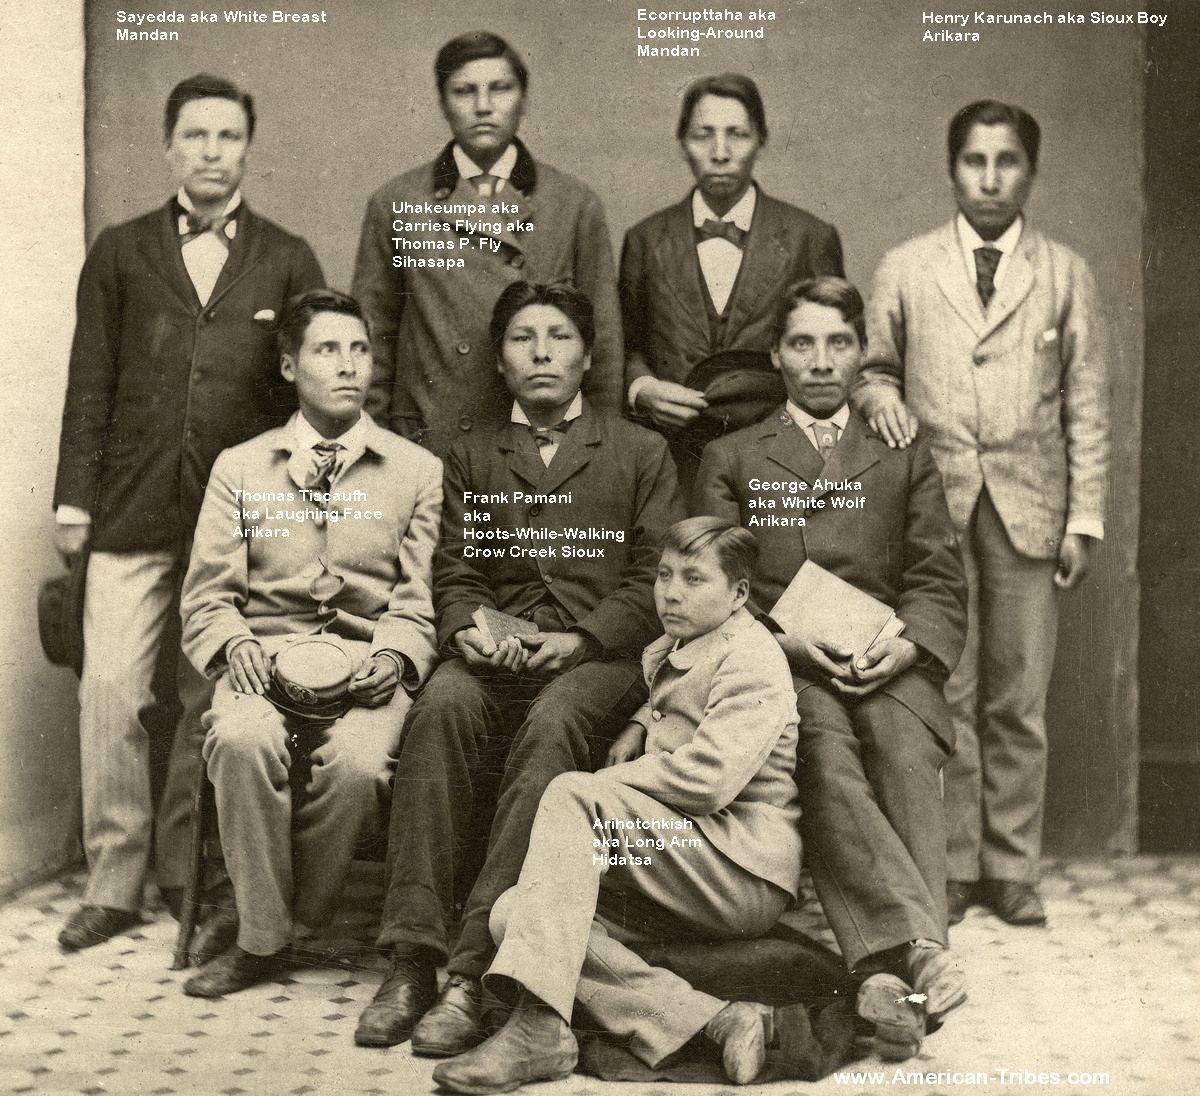 http://www.american-tribes.com/messageboards/dietmar/hamptonID1.jpg